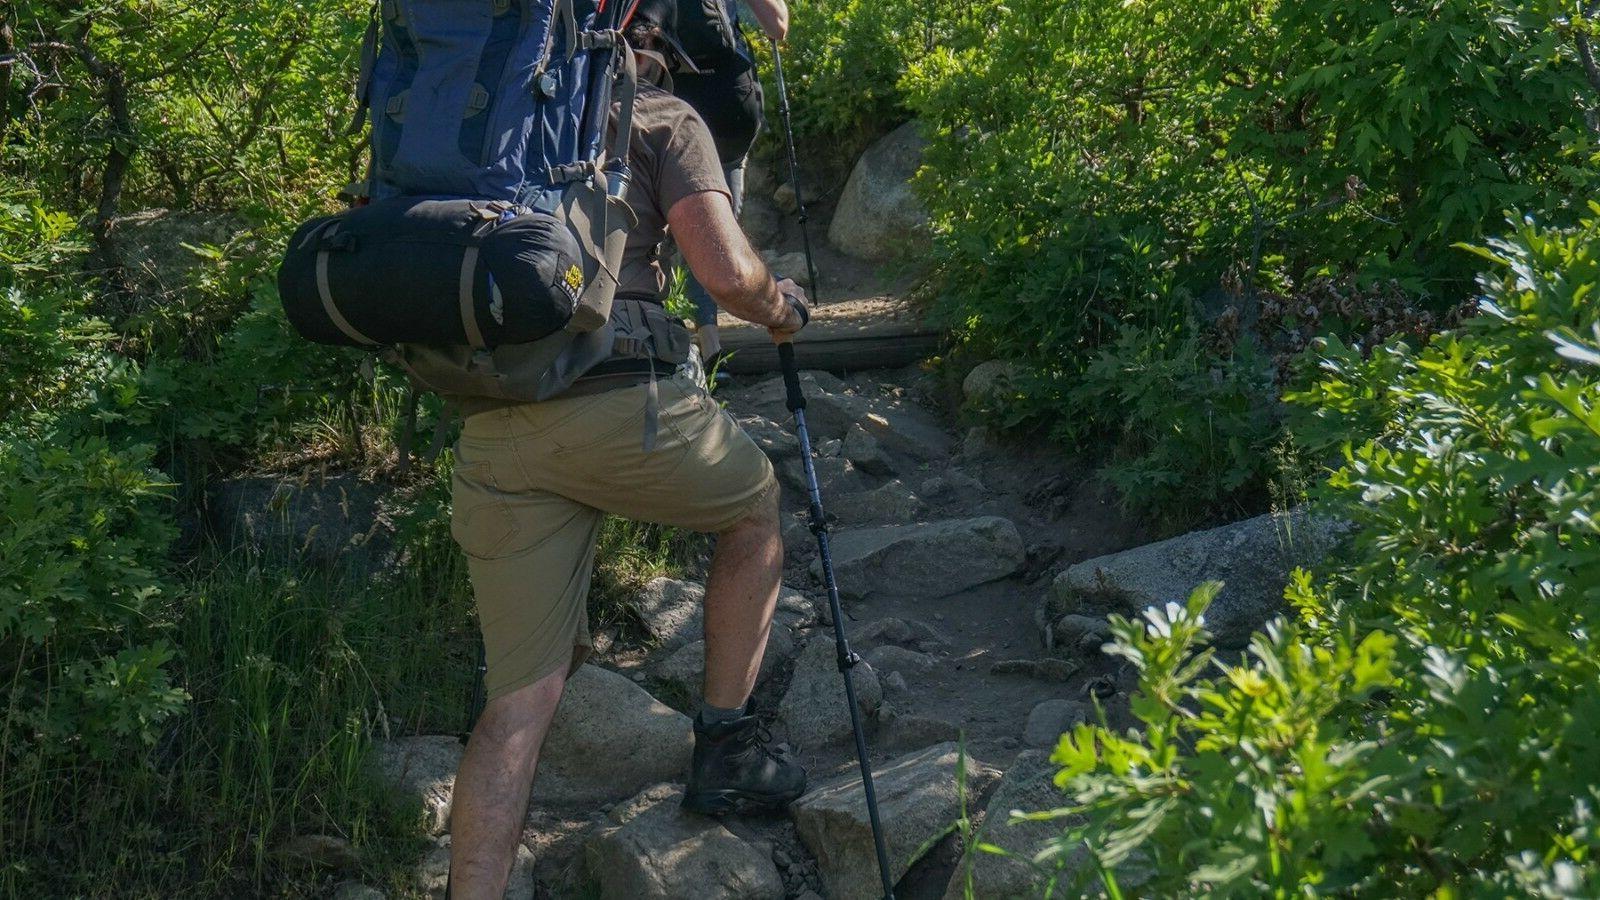 Stage Quick Trekking Hiking Cork Grips - season